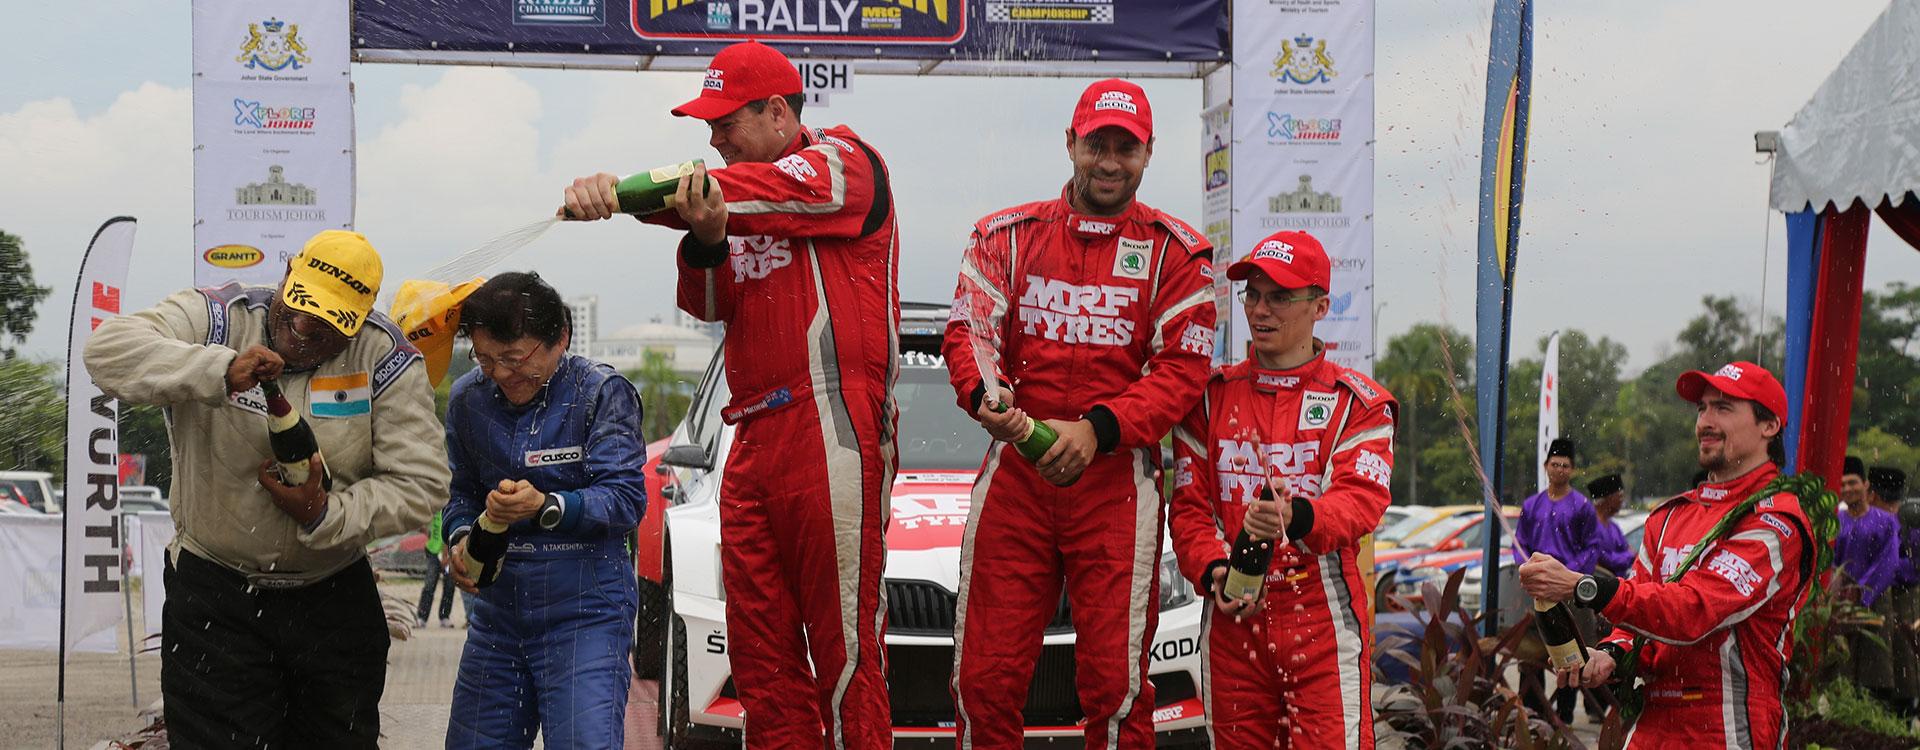 APRC: Gill wins championship. ŠKODA celebrates its fifth consecutive title